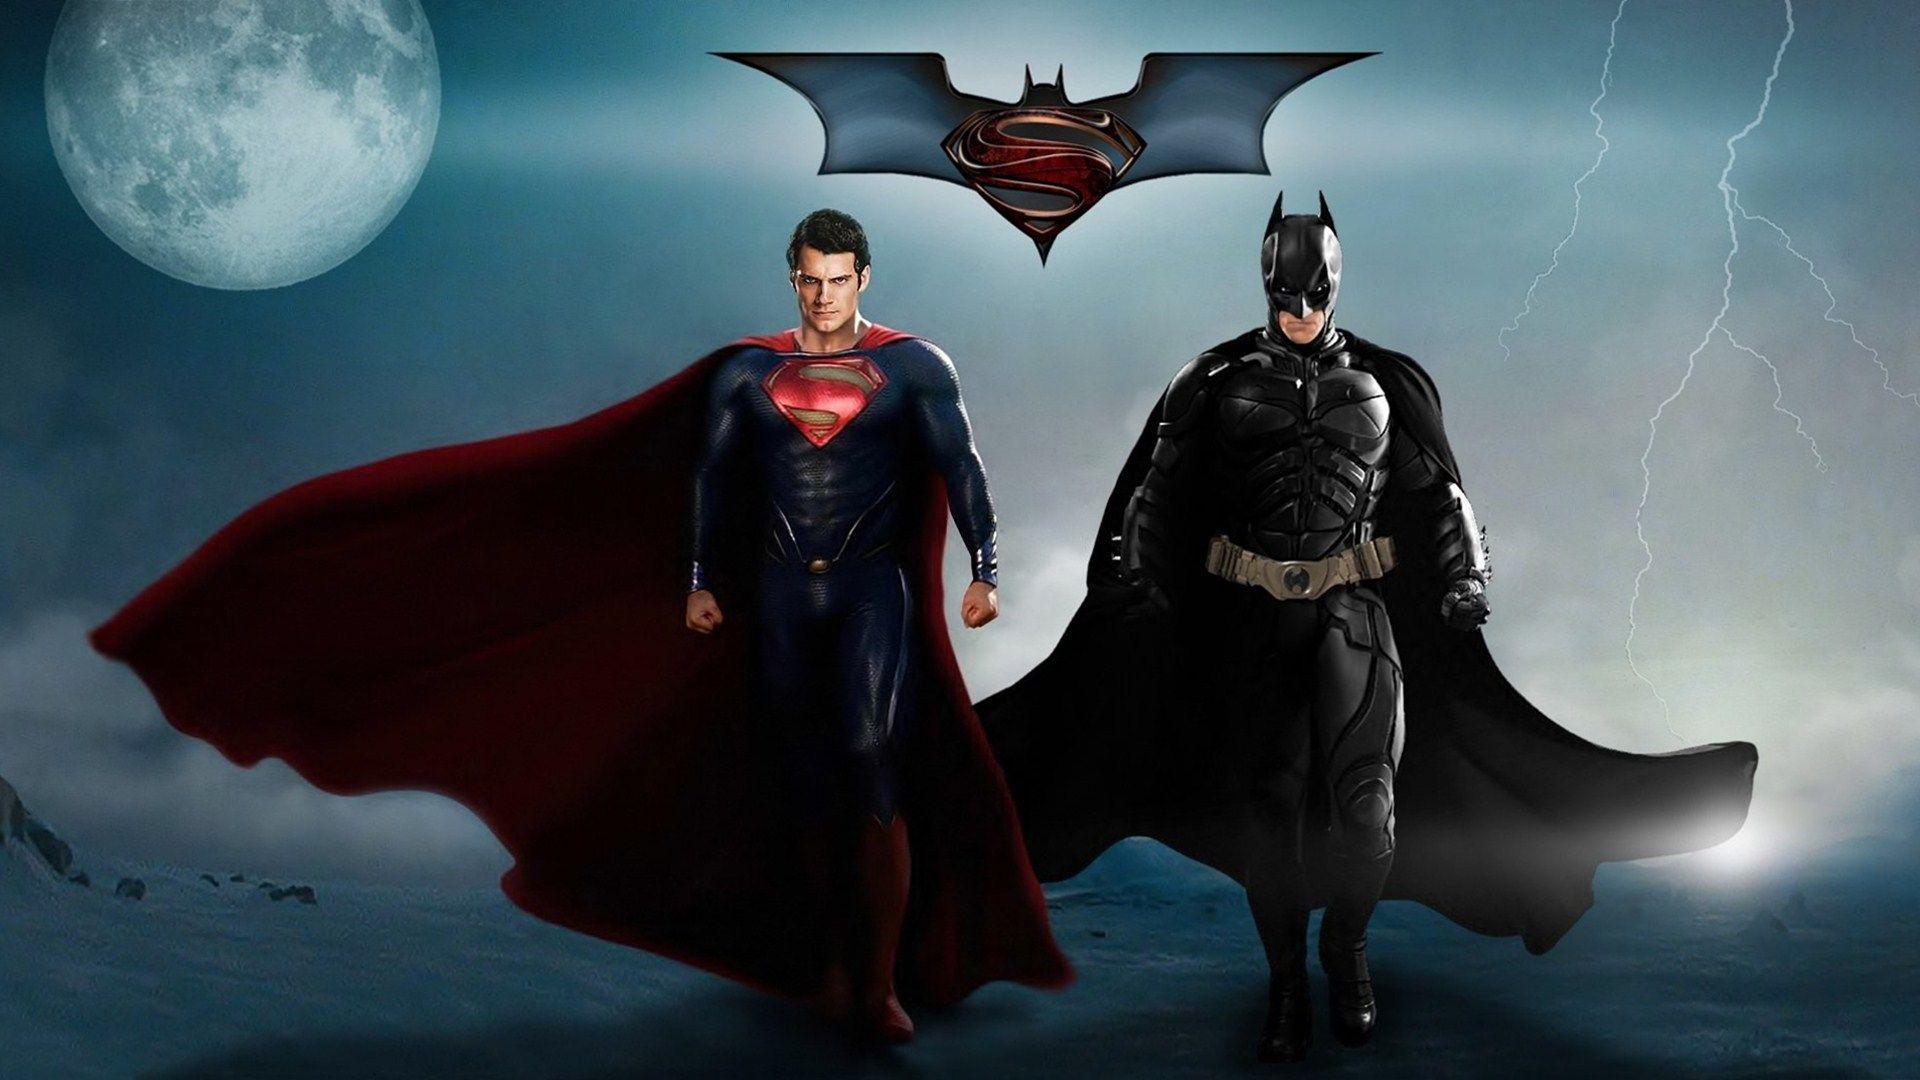 batman vs superman hd wallpapers 12 #batmanvssupermanhdwallpapers